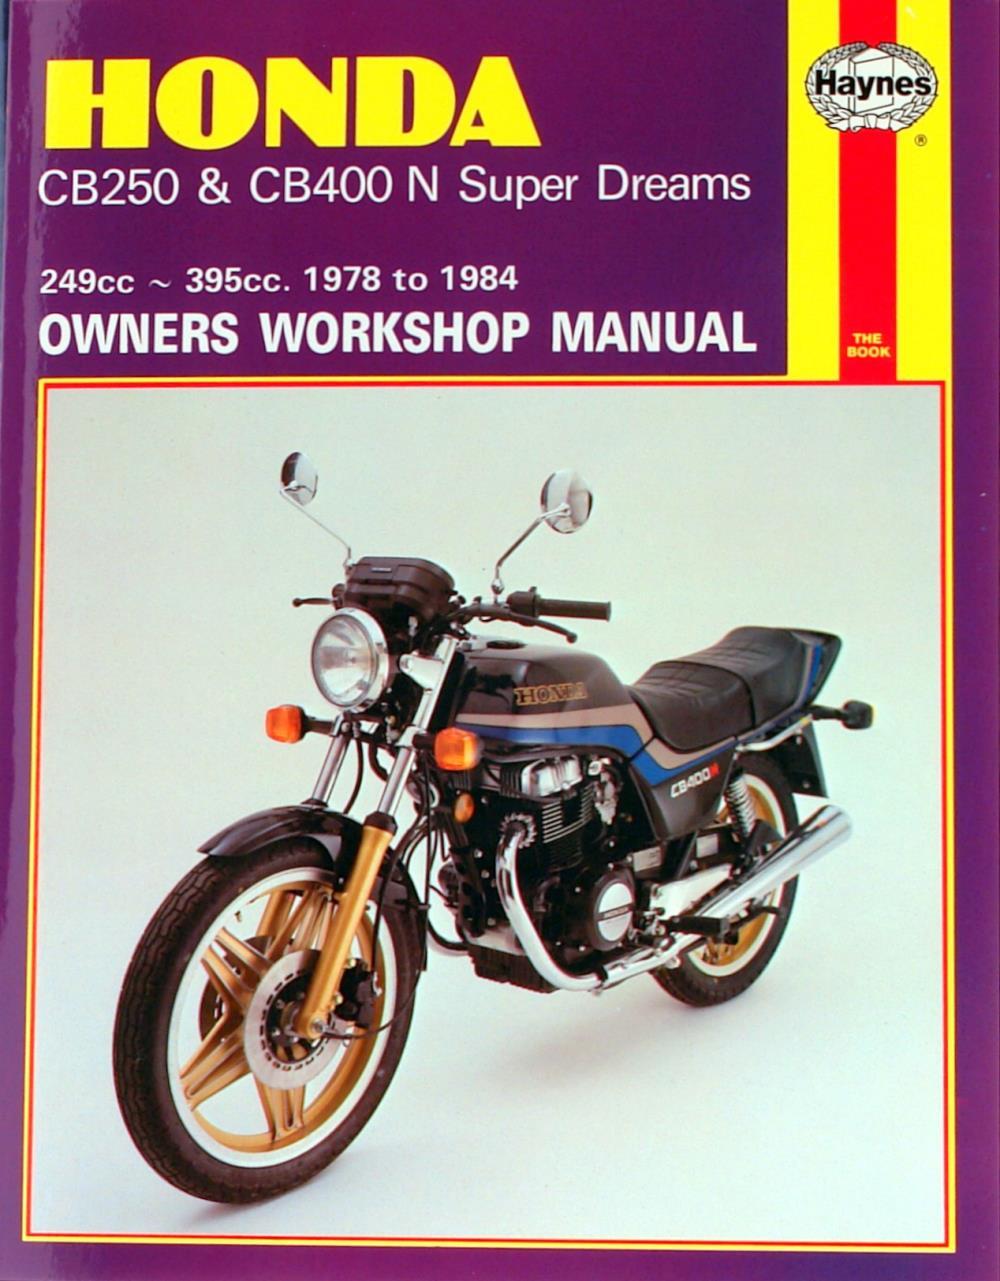 manual haynes for 1981 honda cb 250 ndb super dream ebay. Black Bedroom Furniture Sets. Home Design Ideas